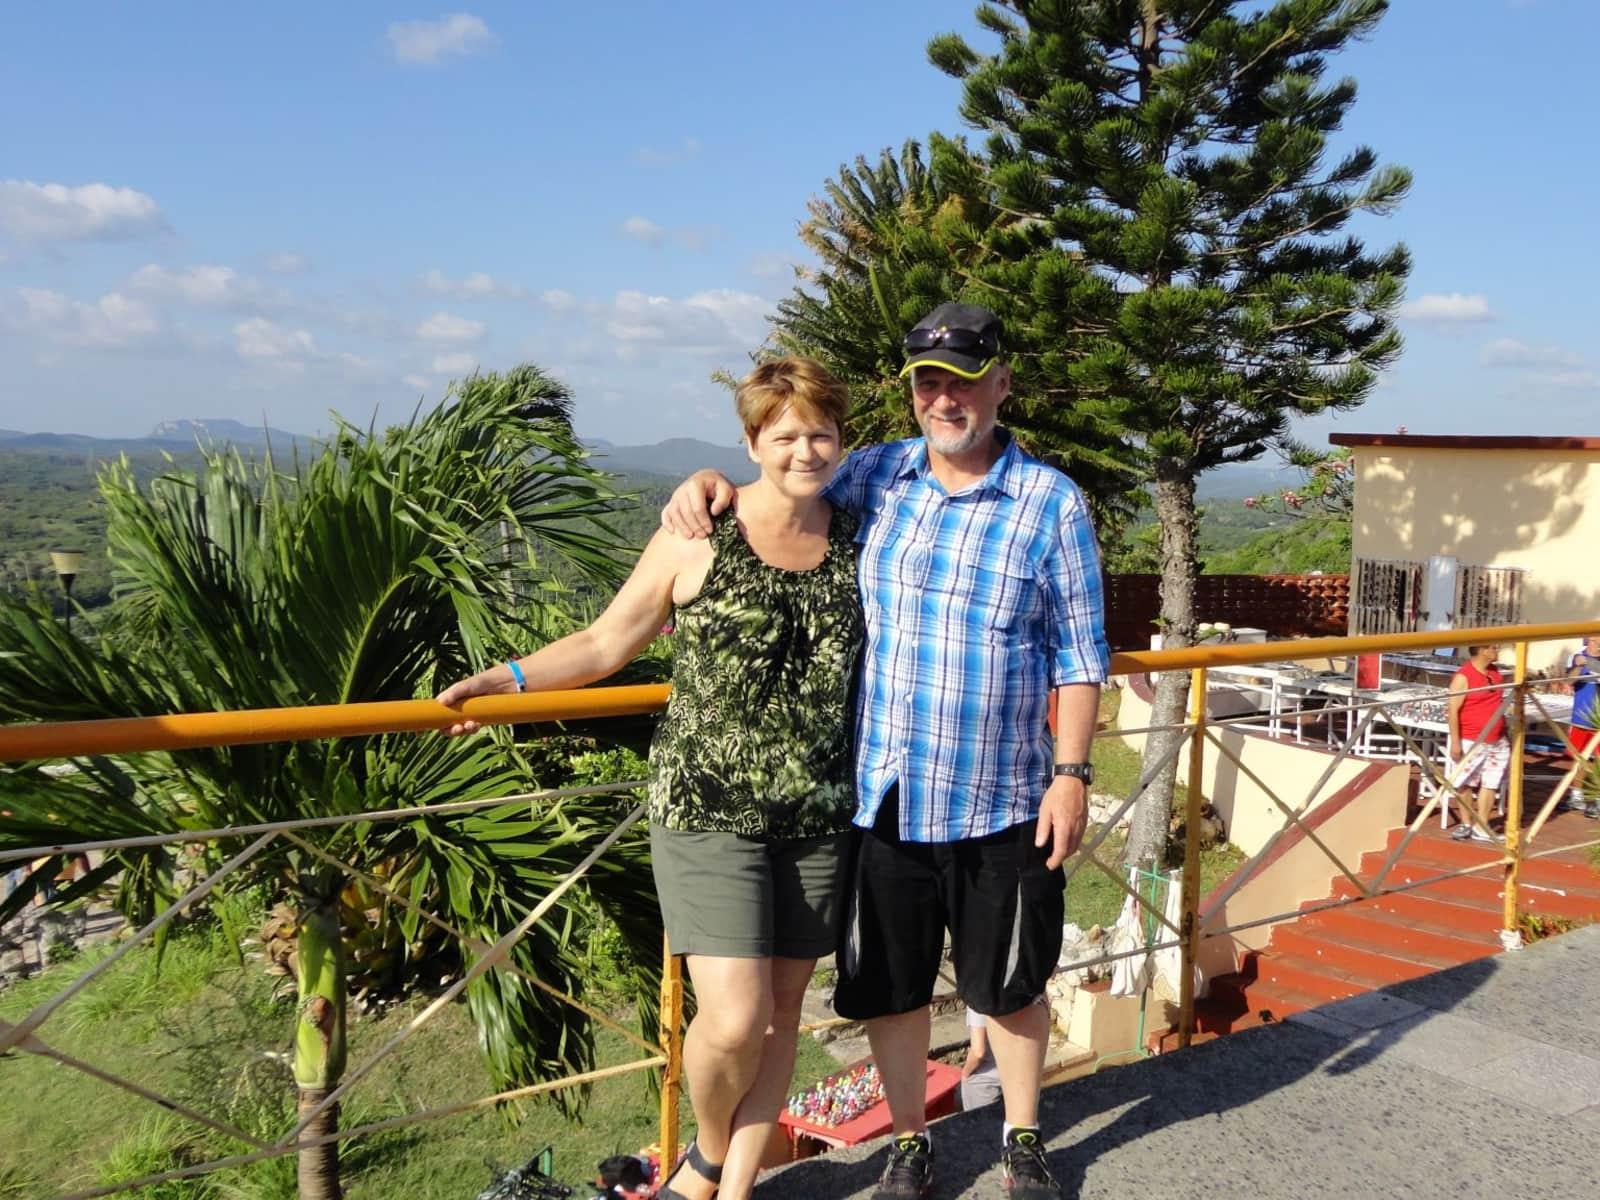 Gary & Therese from Ottawa, Ontario, Canada